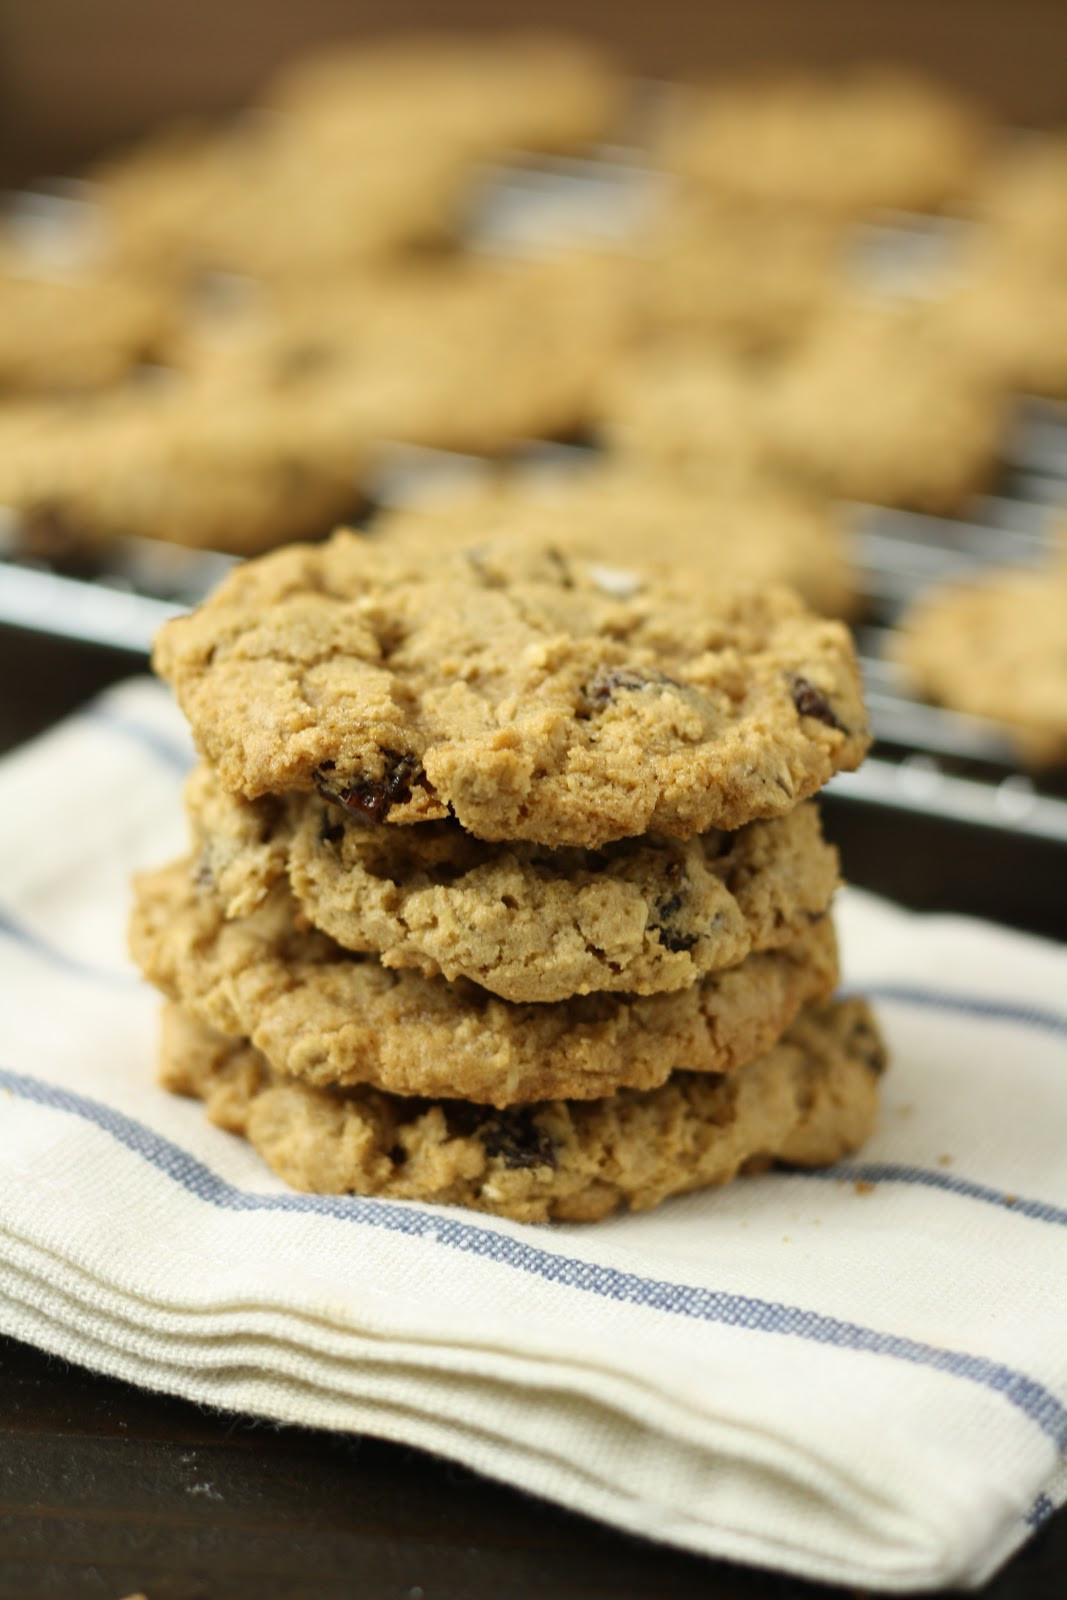 Gluten Free Oatmeal Cookies  Gluten Free Dessert Recipes for National Oatmeal Cookie